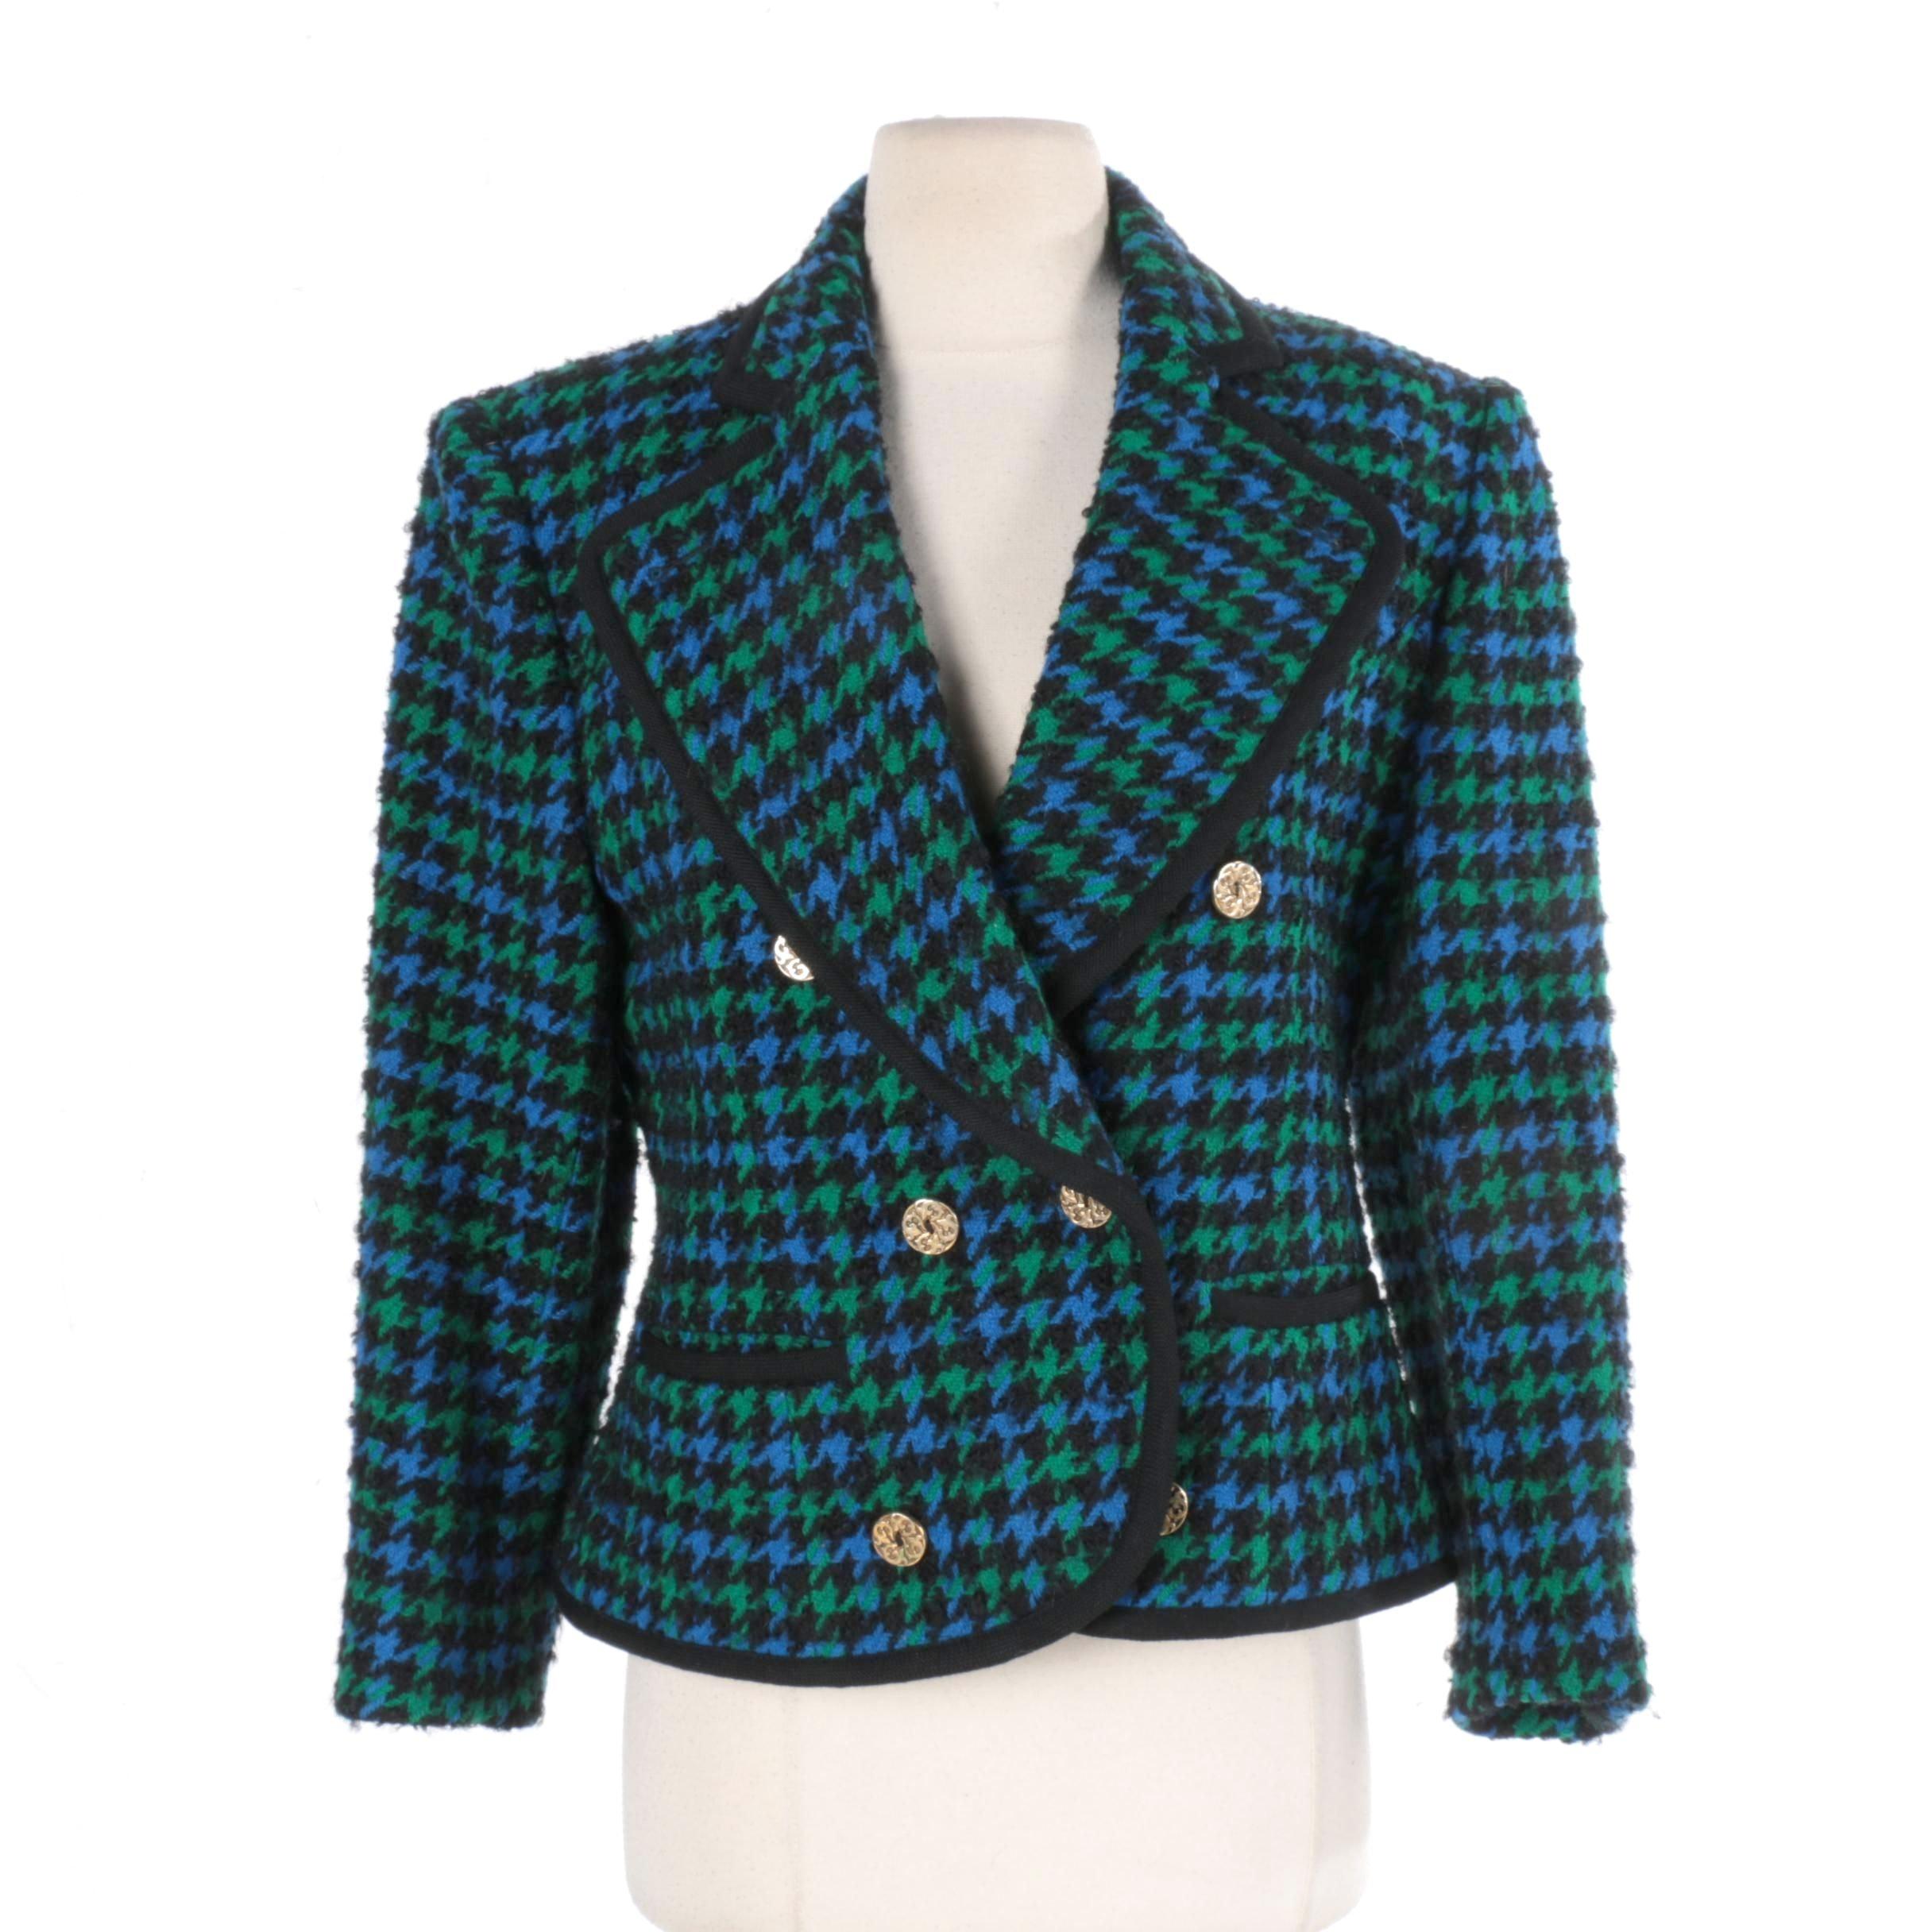 Women's Guy Laroche Boutique Paris Houndstooth Check Blazer